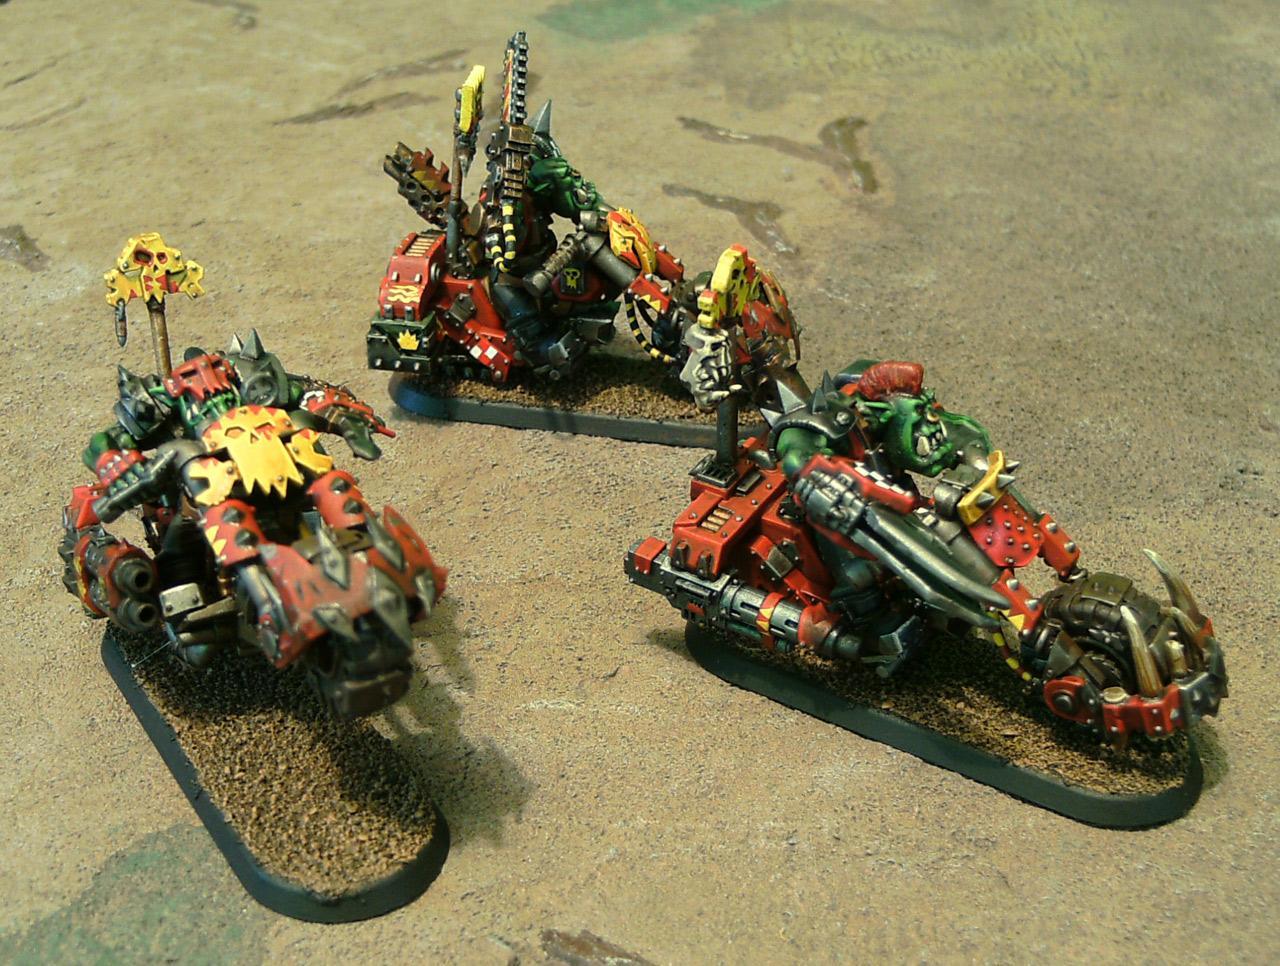 Bike, Evil Suns, Motorcycles, Nob Bikers, Orks, Ouze, Power Claw, Power Klaw, Warbikers, Warhammer 40,000